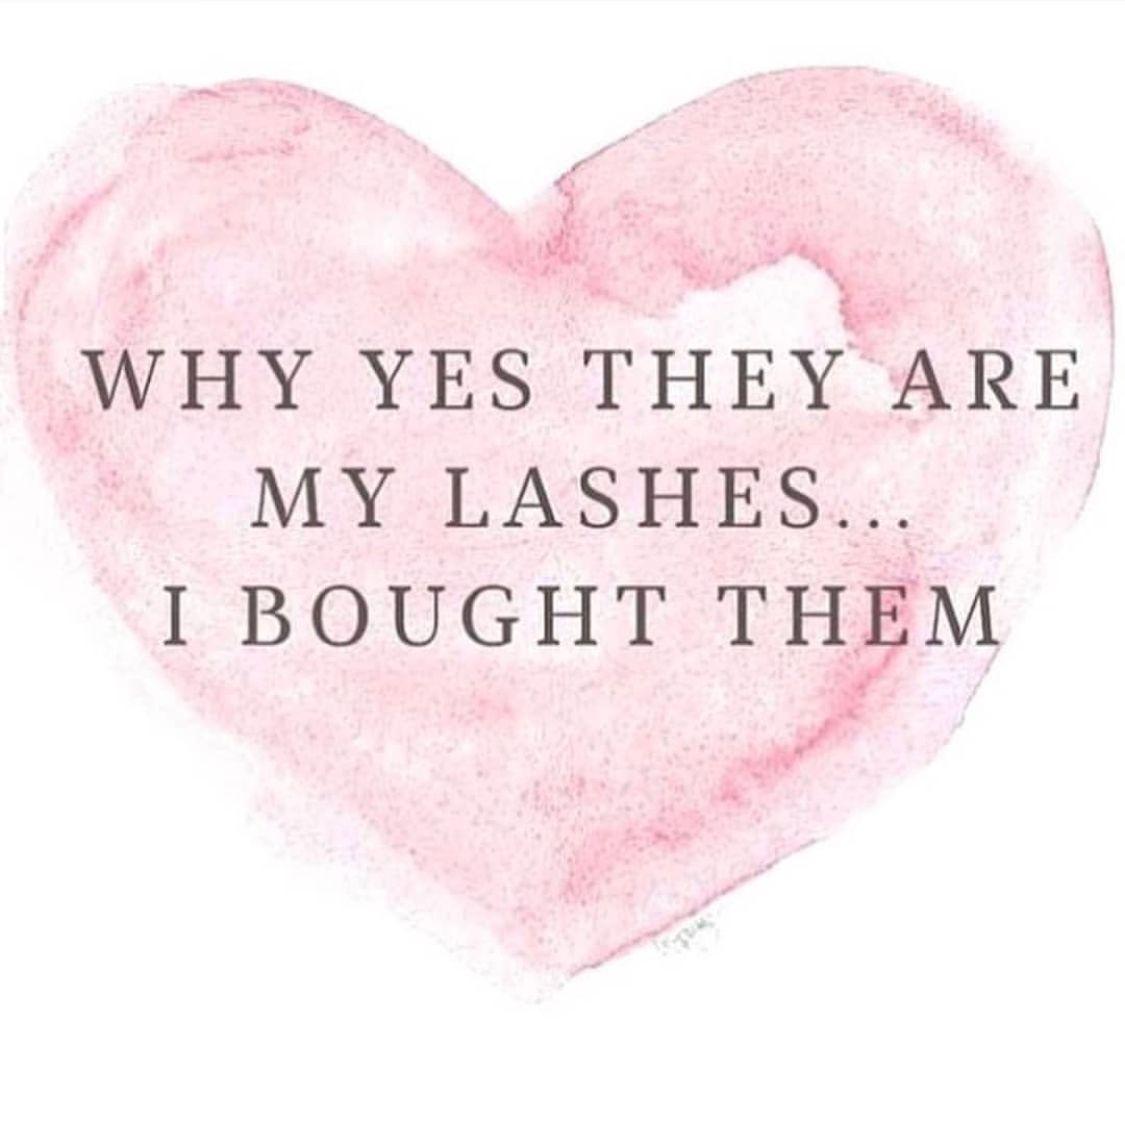 Eyelash Extensions The Splurge You Deserve: Follow Me To Beautiful Lashes!